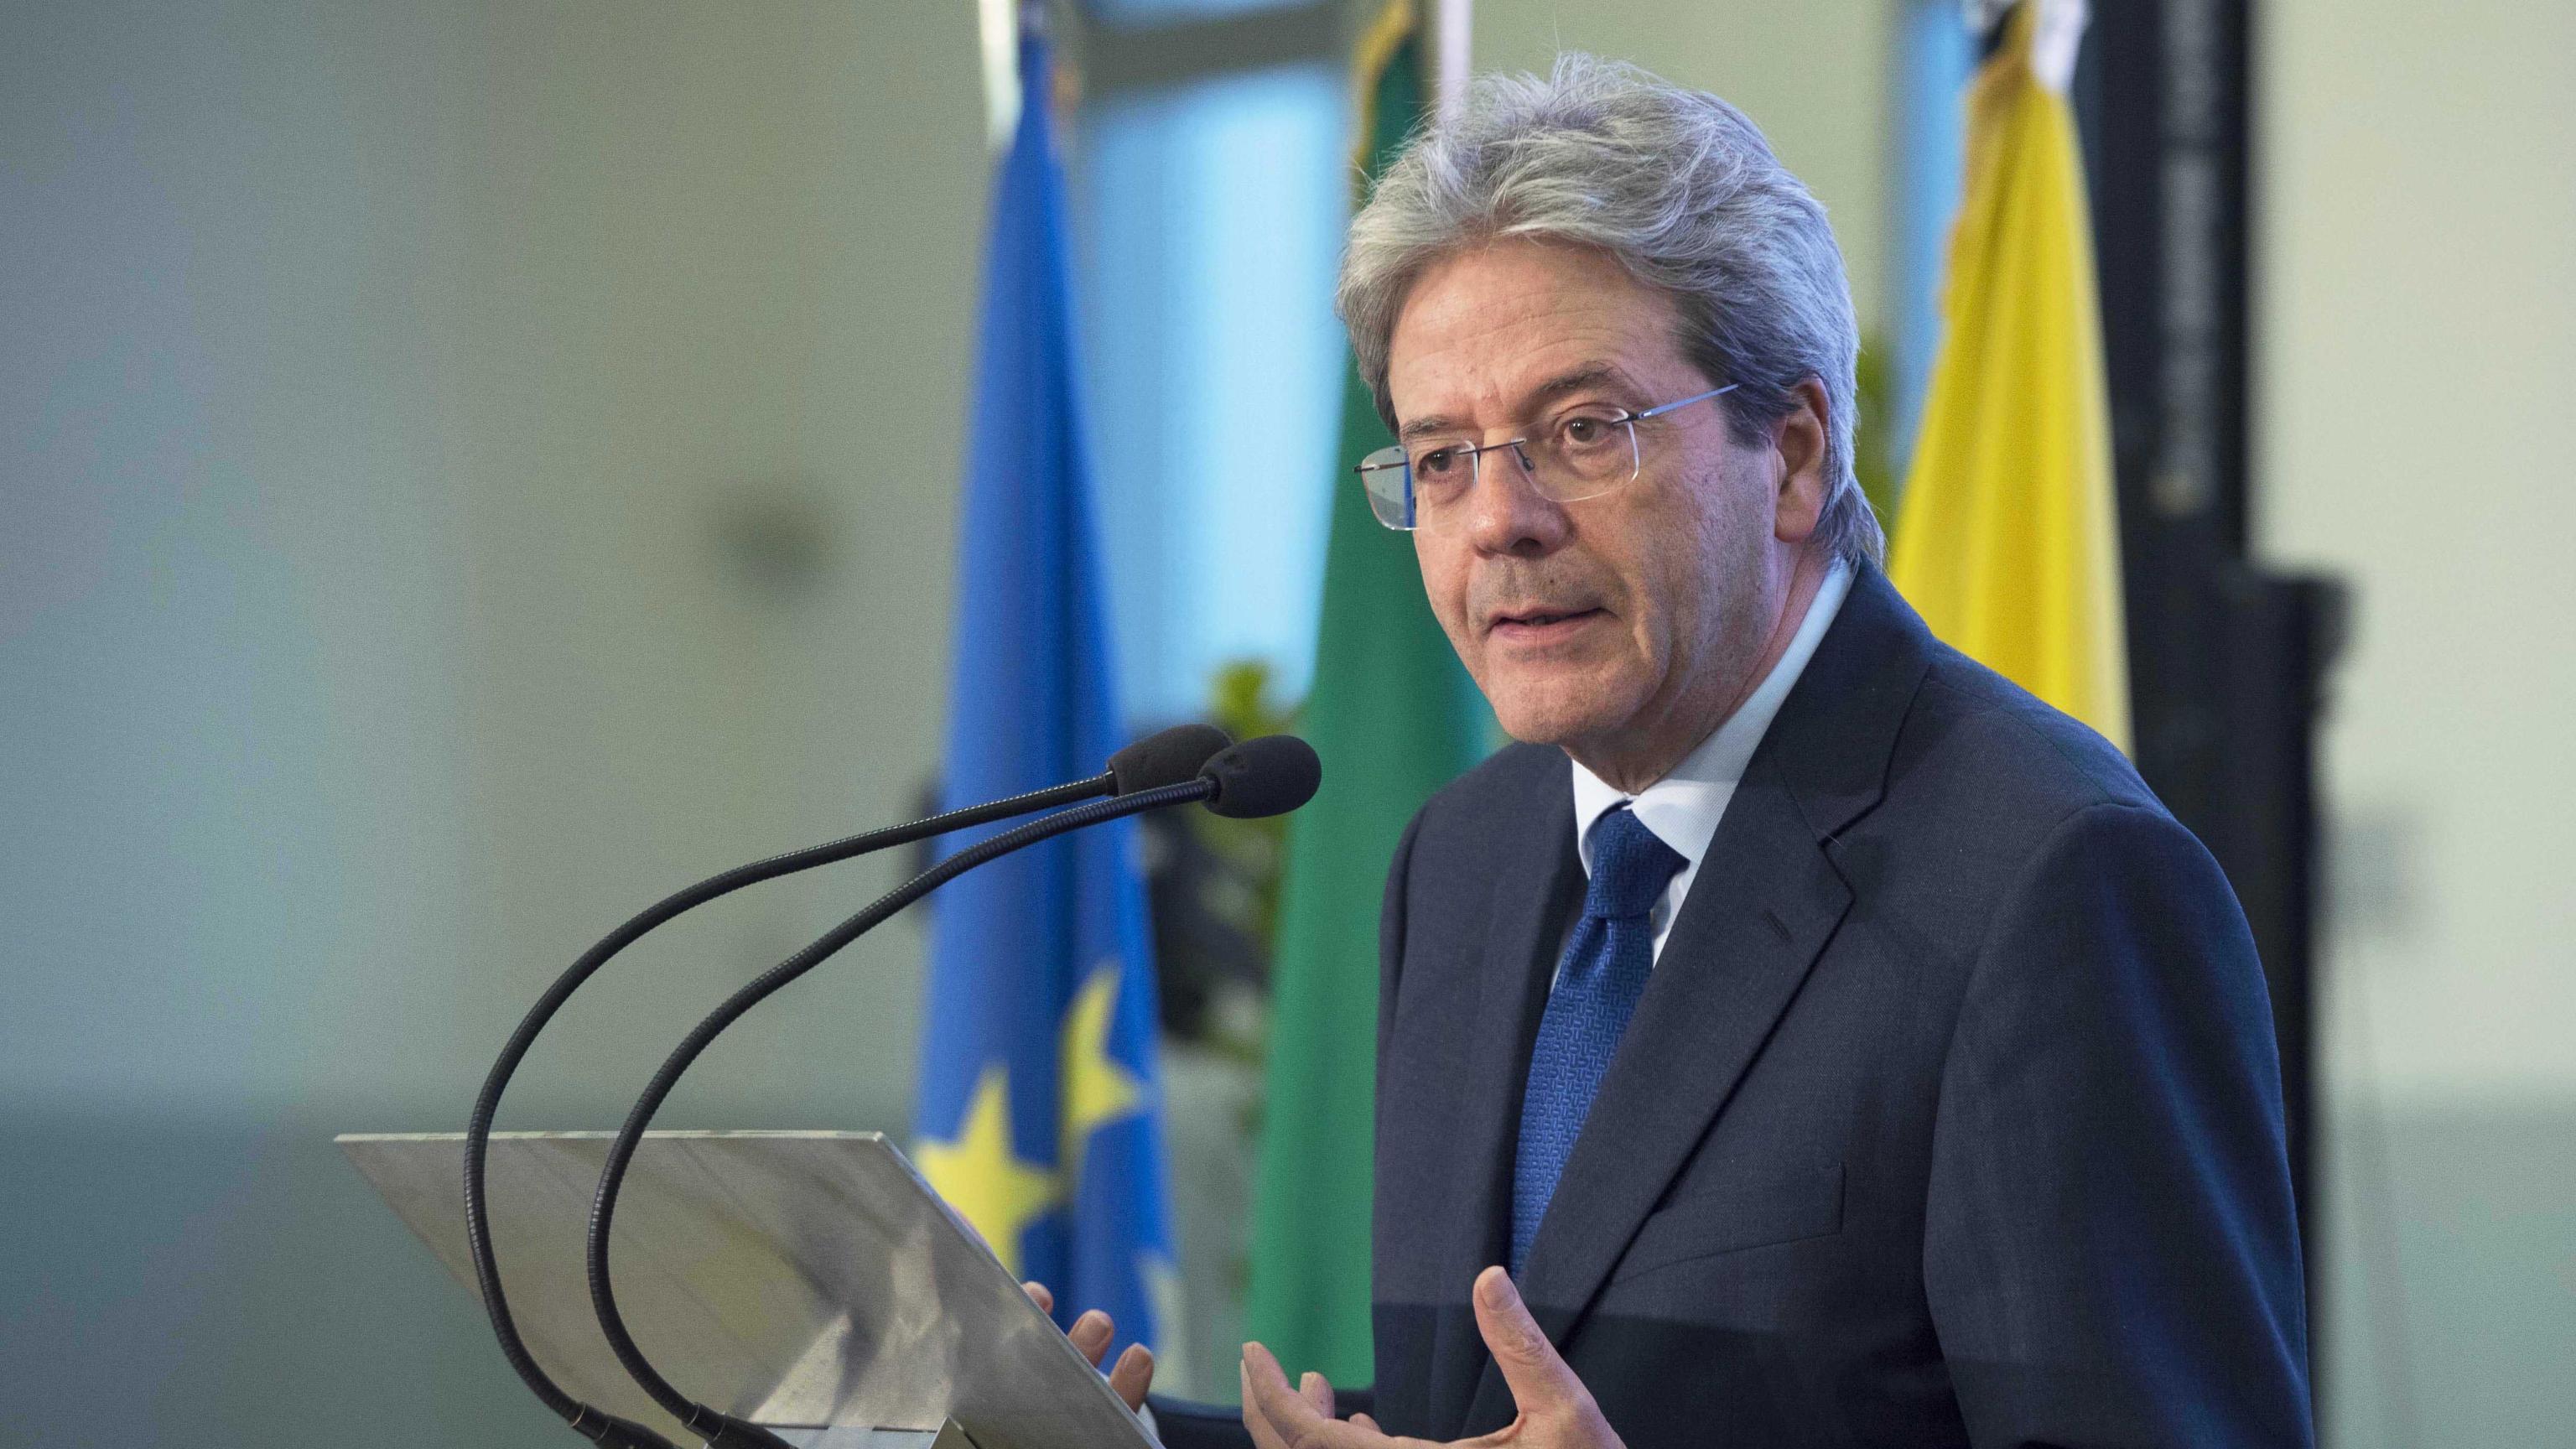 Gentiloni,è ora forze progressiste in Ue